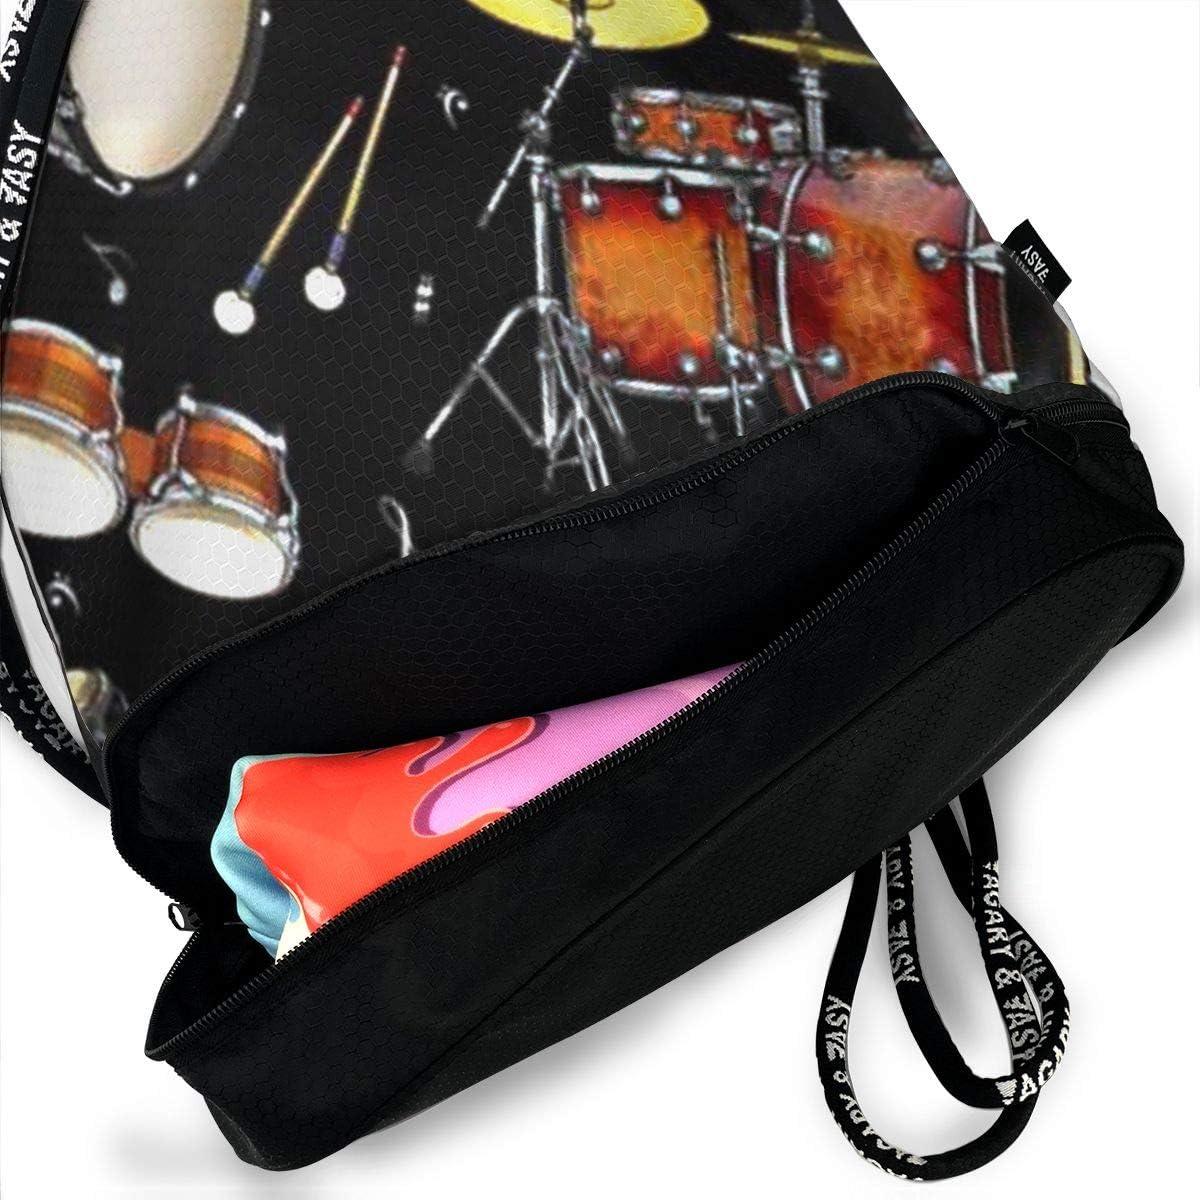 Fashion Outdoor Zipper Drawstring Bag Rock Drum Printed Bundle Backpack for Men Women Unisex Multi-Function Backpack